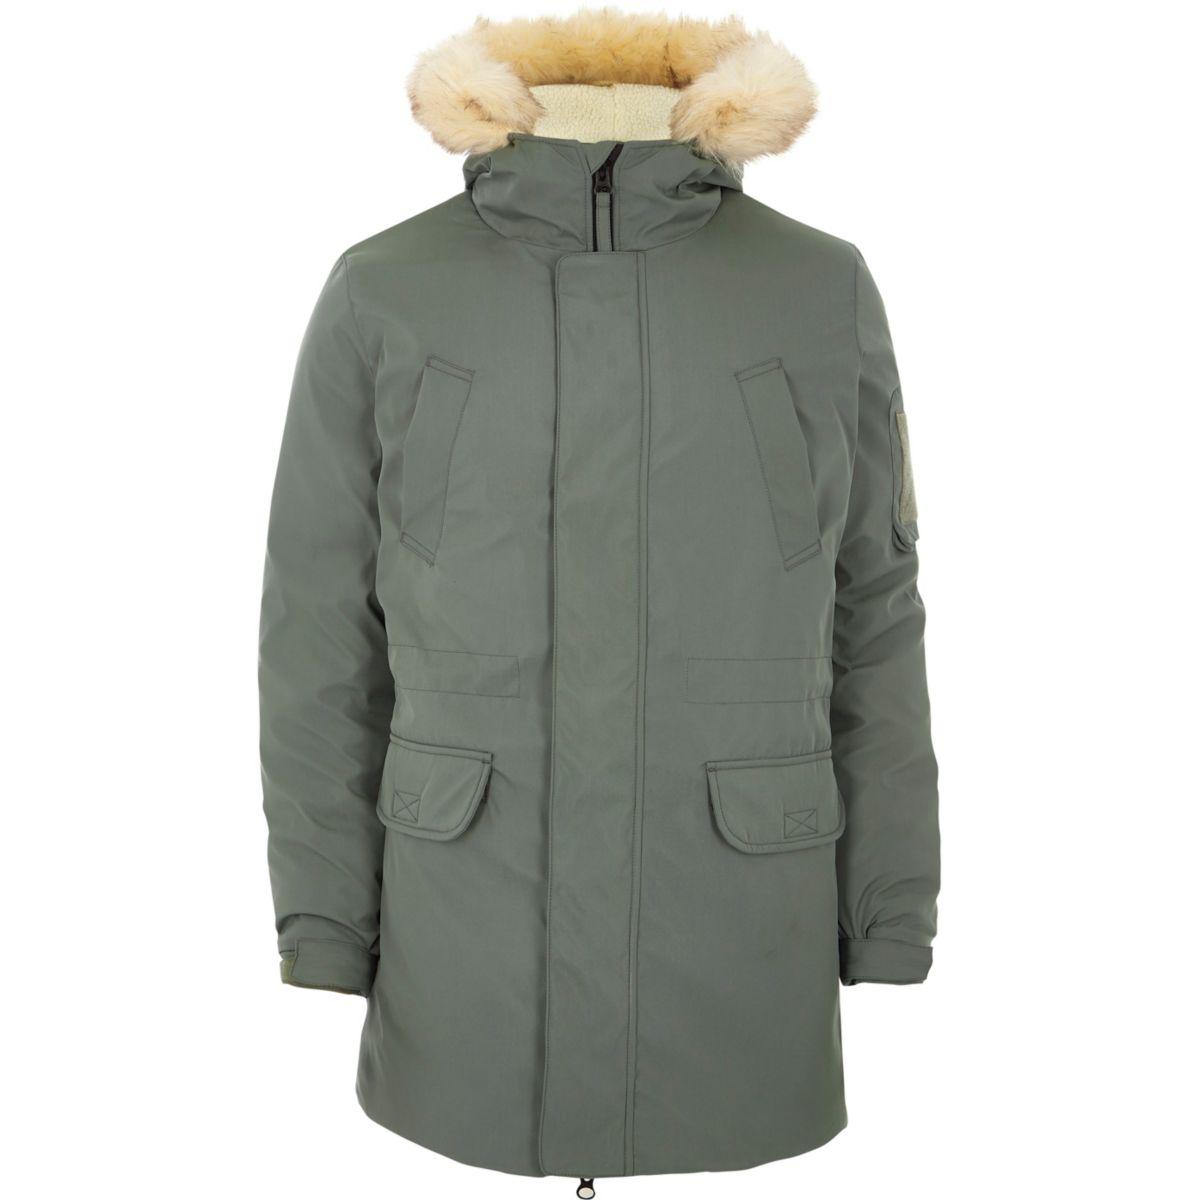 a4ba5bb95f7a Highstead Mock Insert Fur Hooded Parka Jacket In Dark Khaki Tokyo Laundry.  Brave Soul Mens Heavy Weight Fur Hood Parka Padded Winter Coat